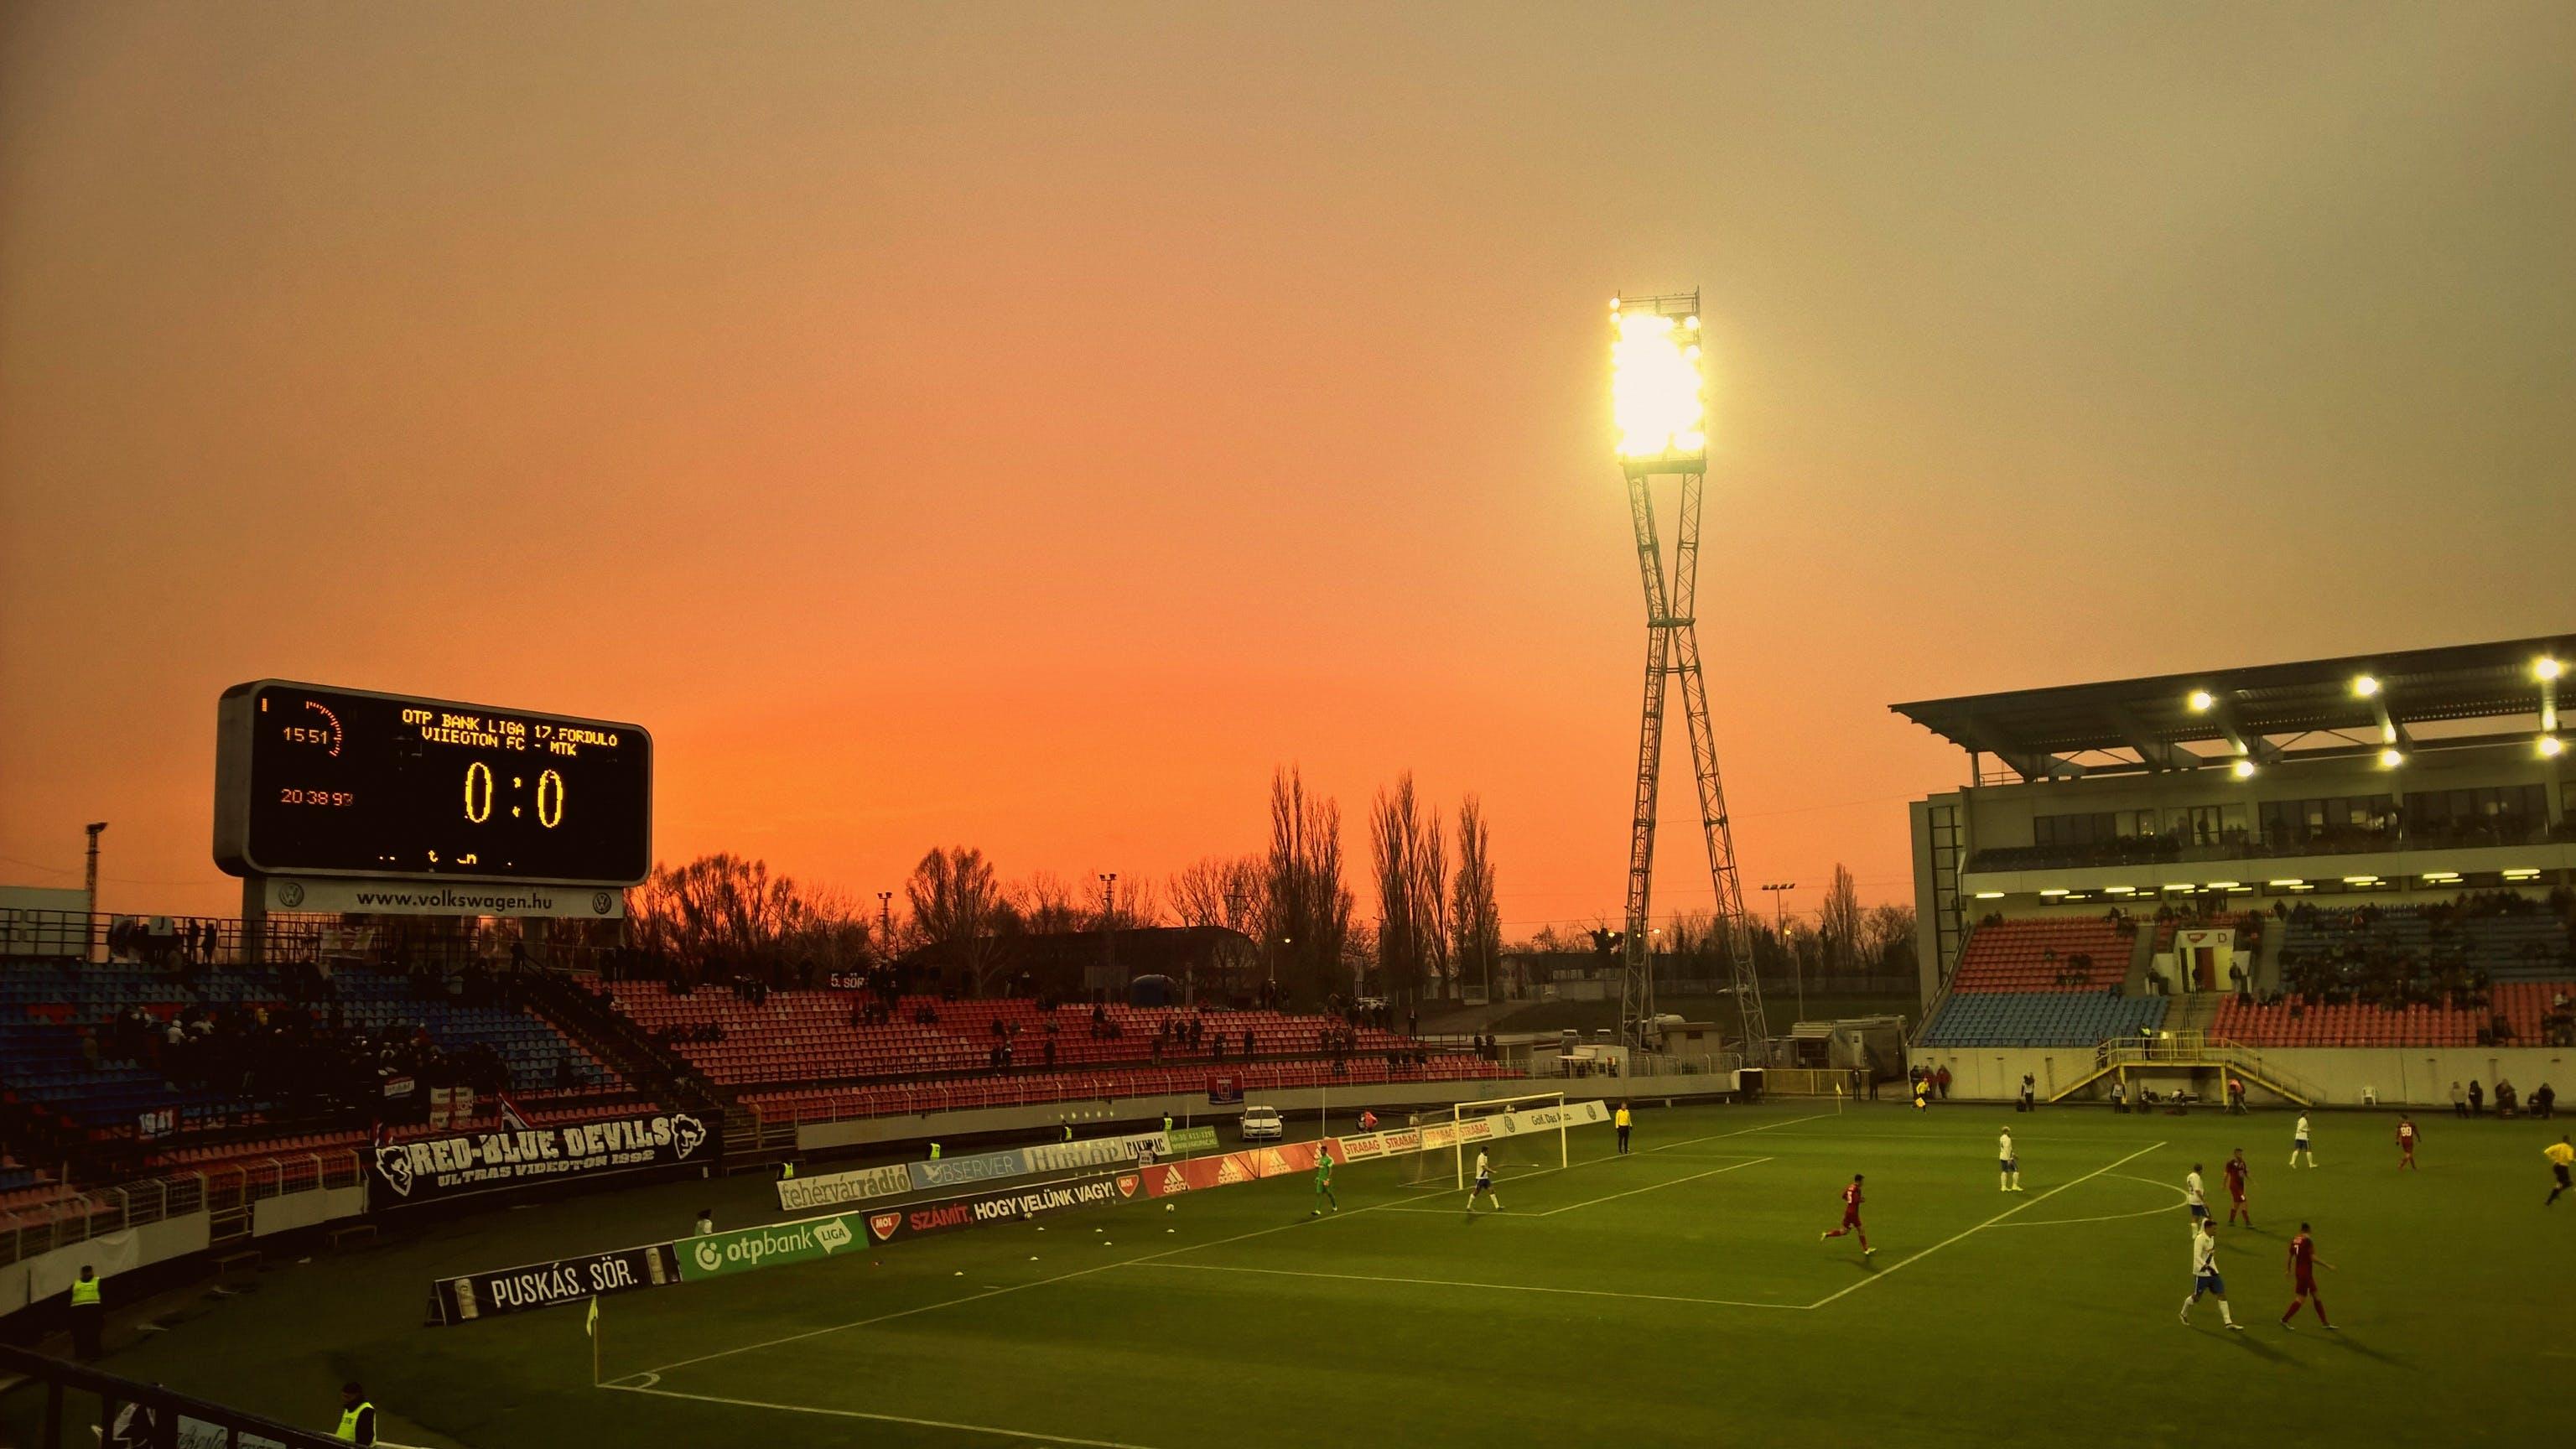 Free stock photo of sunset, football, entertainment, sports